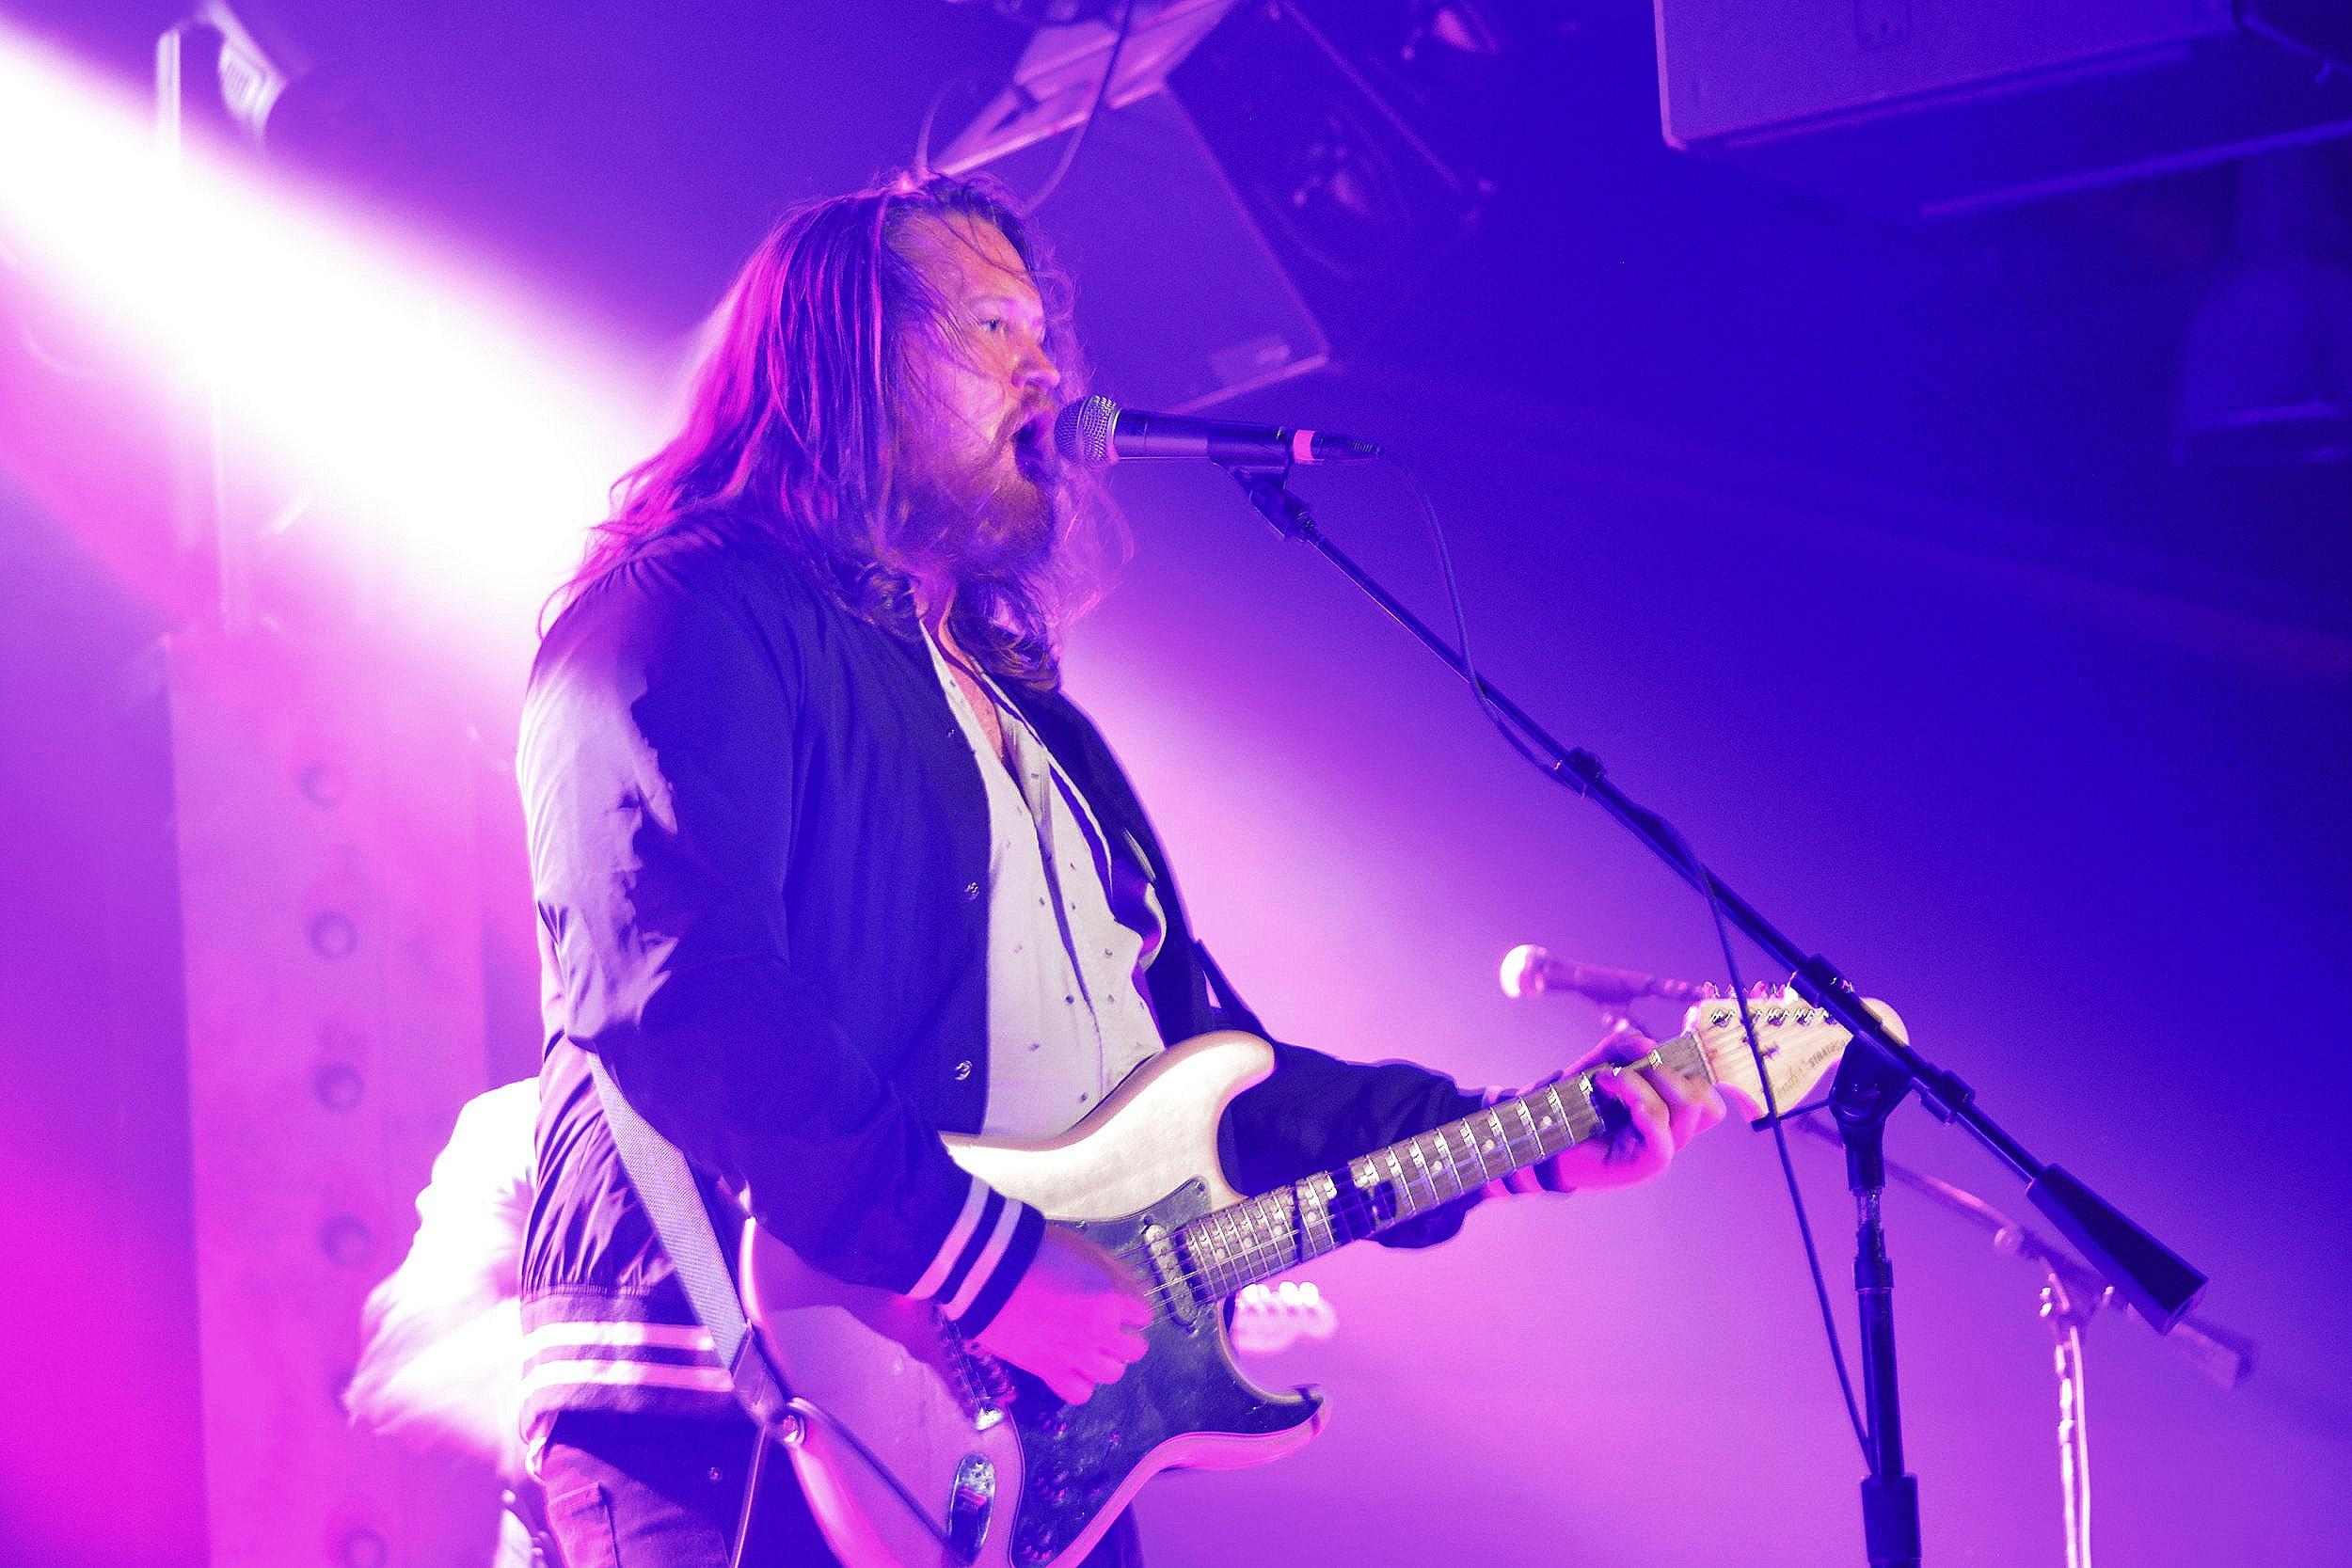 Pete Burton - Guitar, Vocals, Photo: Elsa Cantu